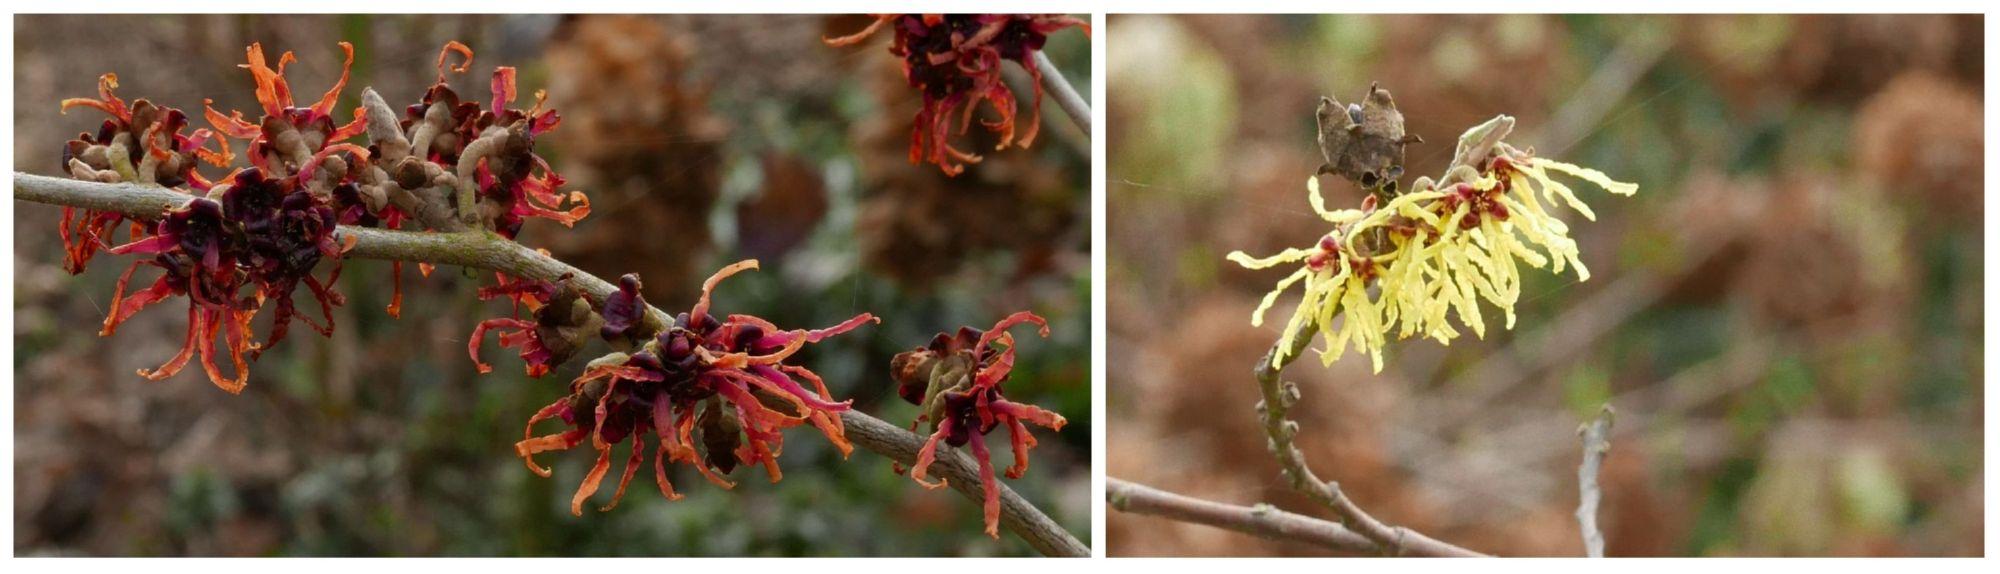 Hamamelis X intermedia 'Ruby Glow', Hamamelis mollis 'Pallida', Goodnestone Park Gardens, 18th February 2018